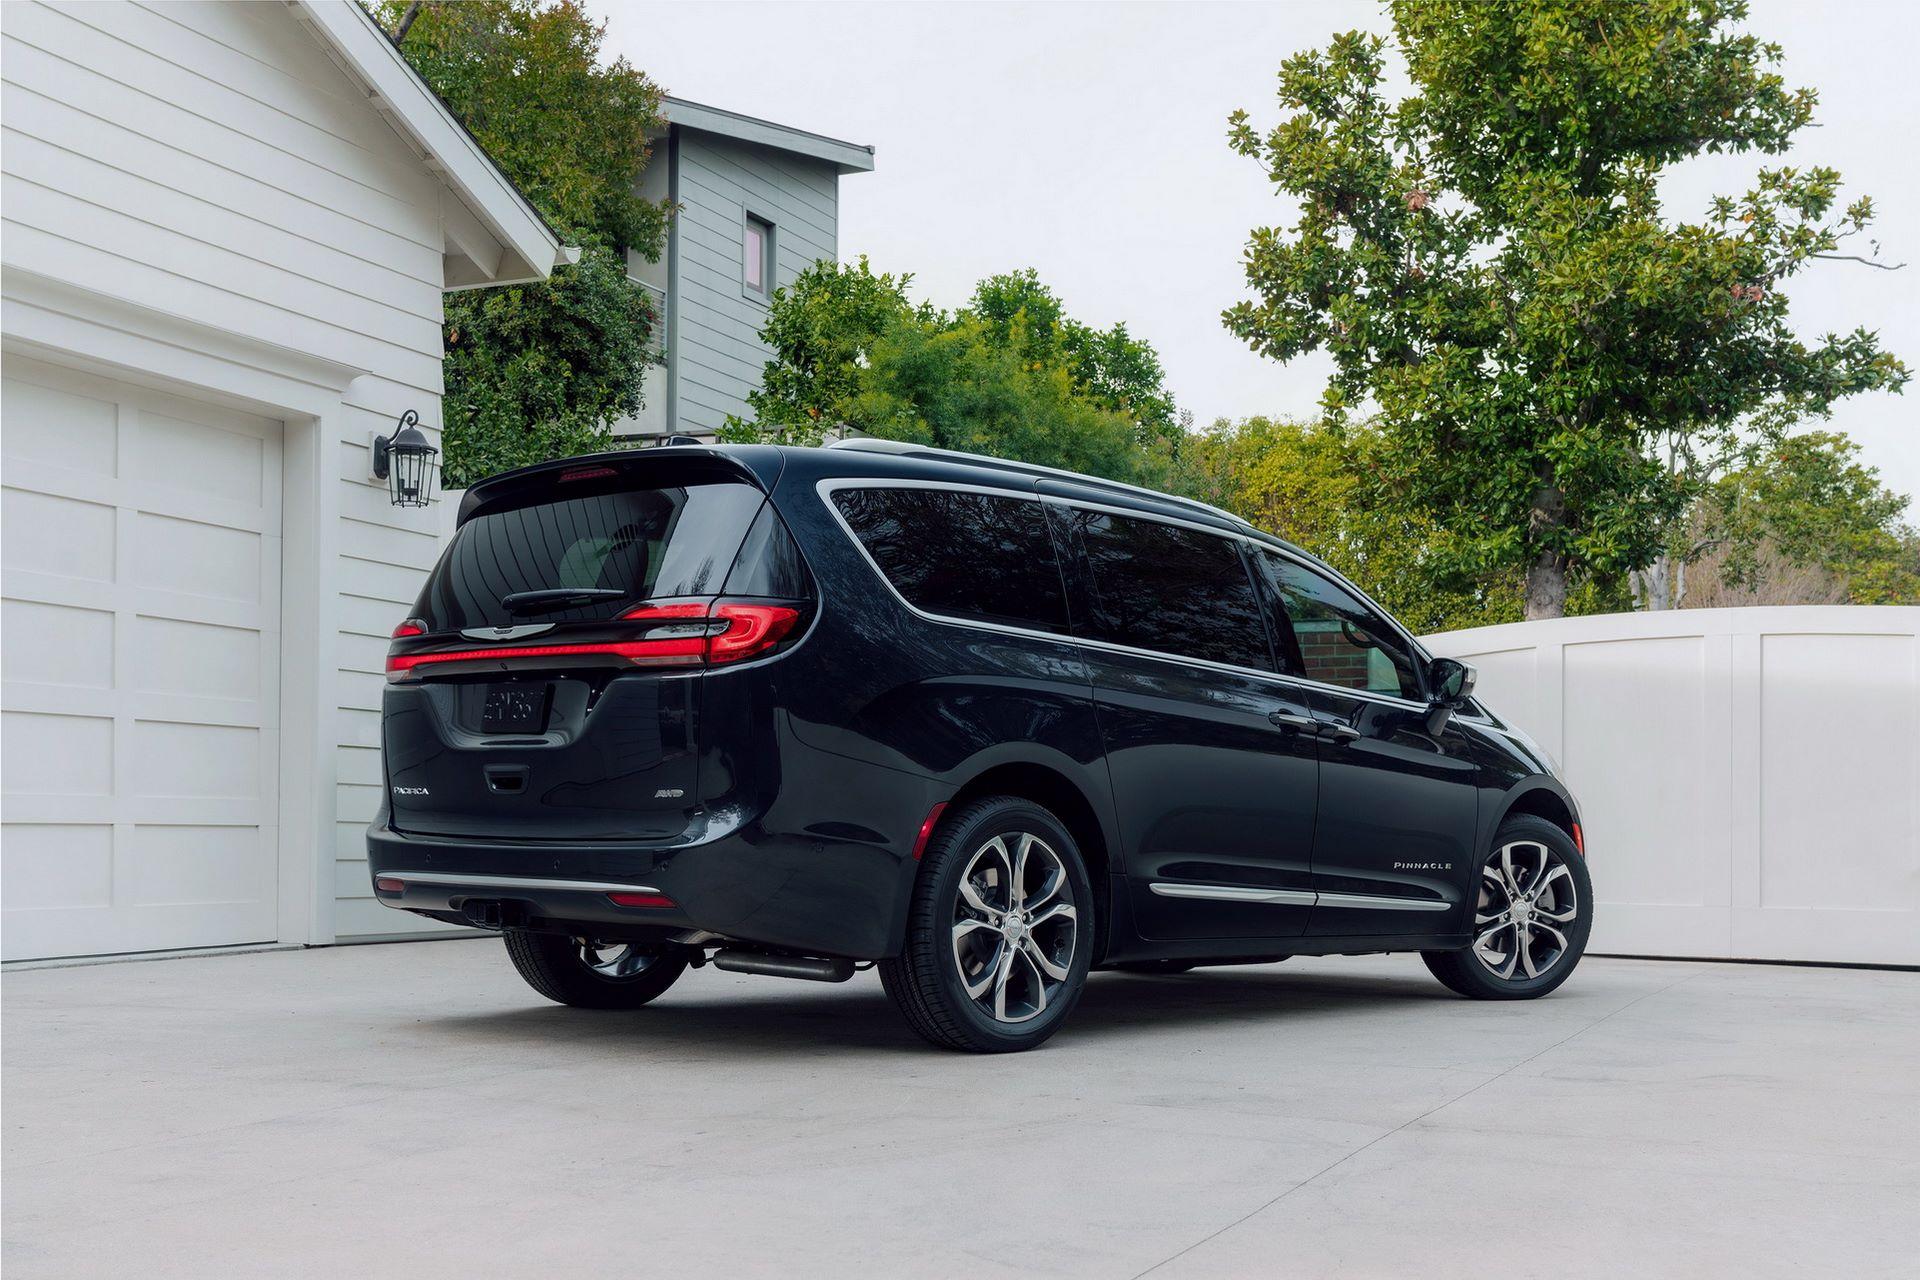 2021-Chrysler-Pacifica-14